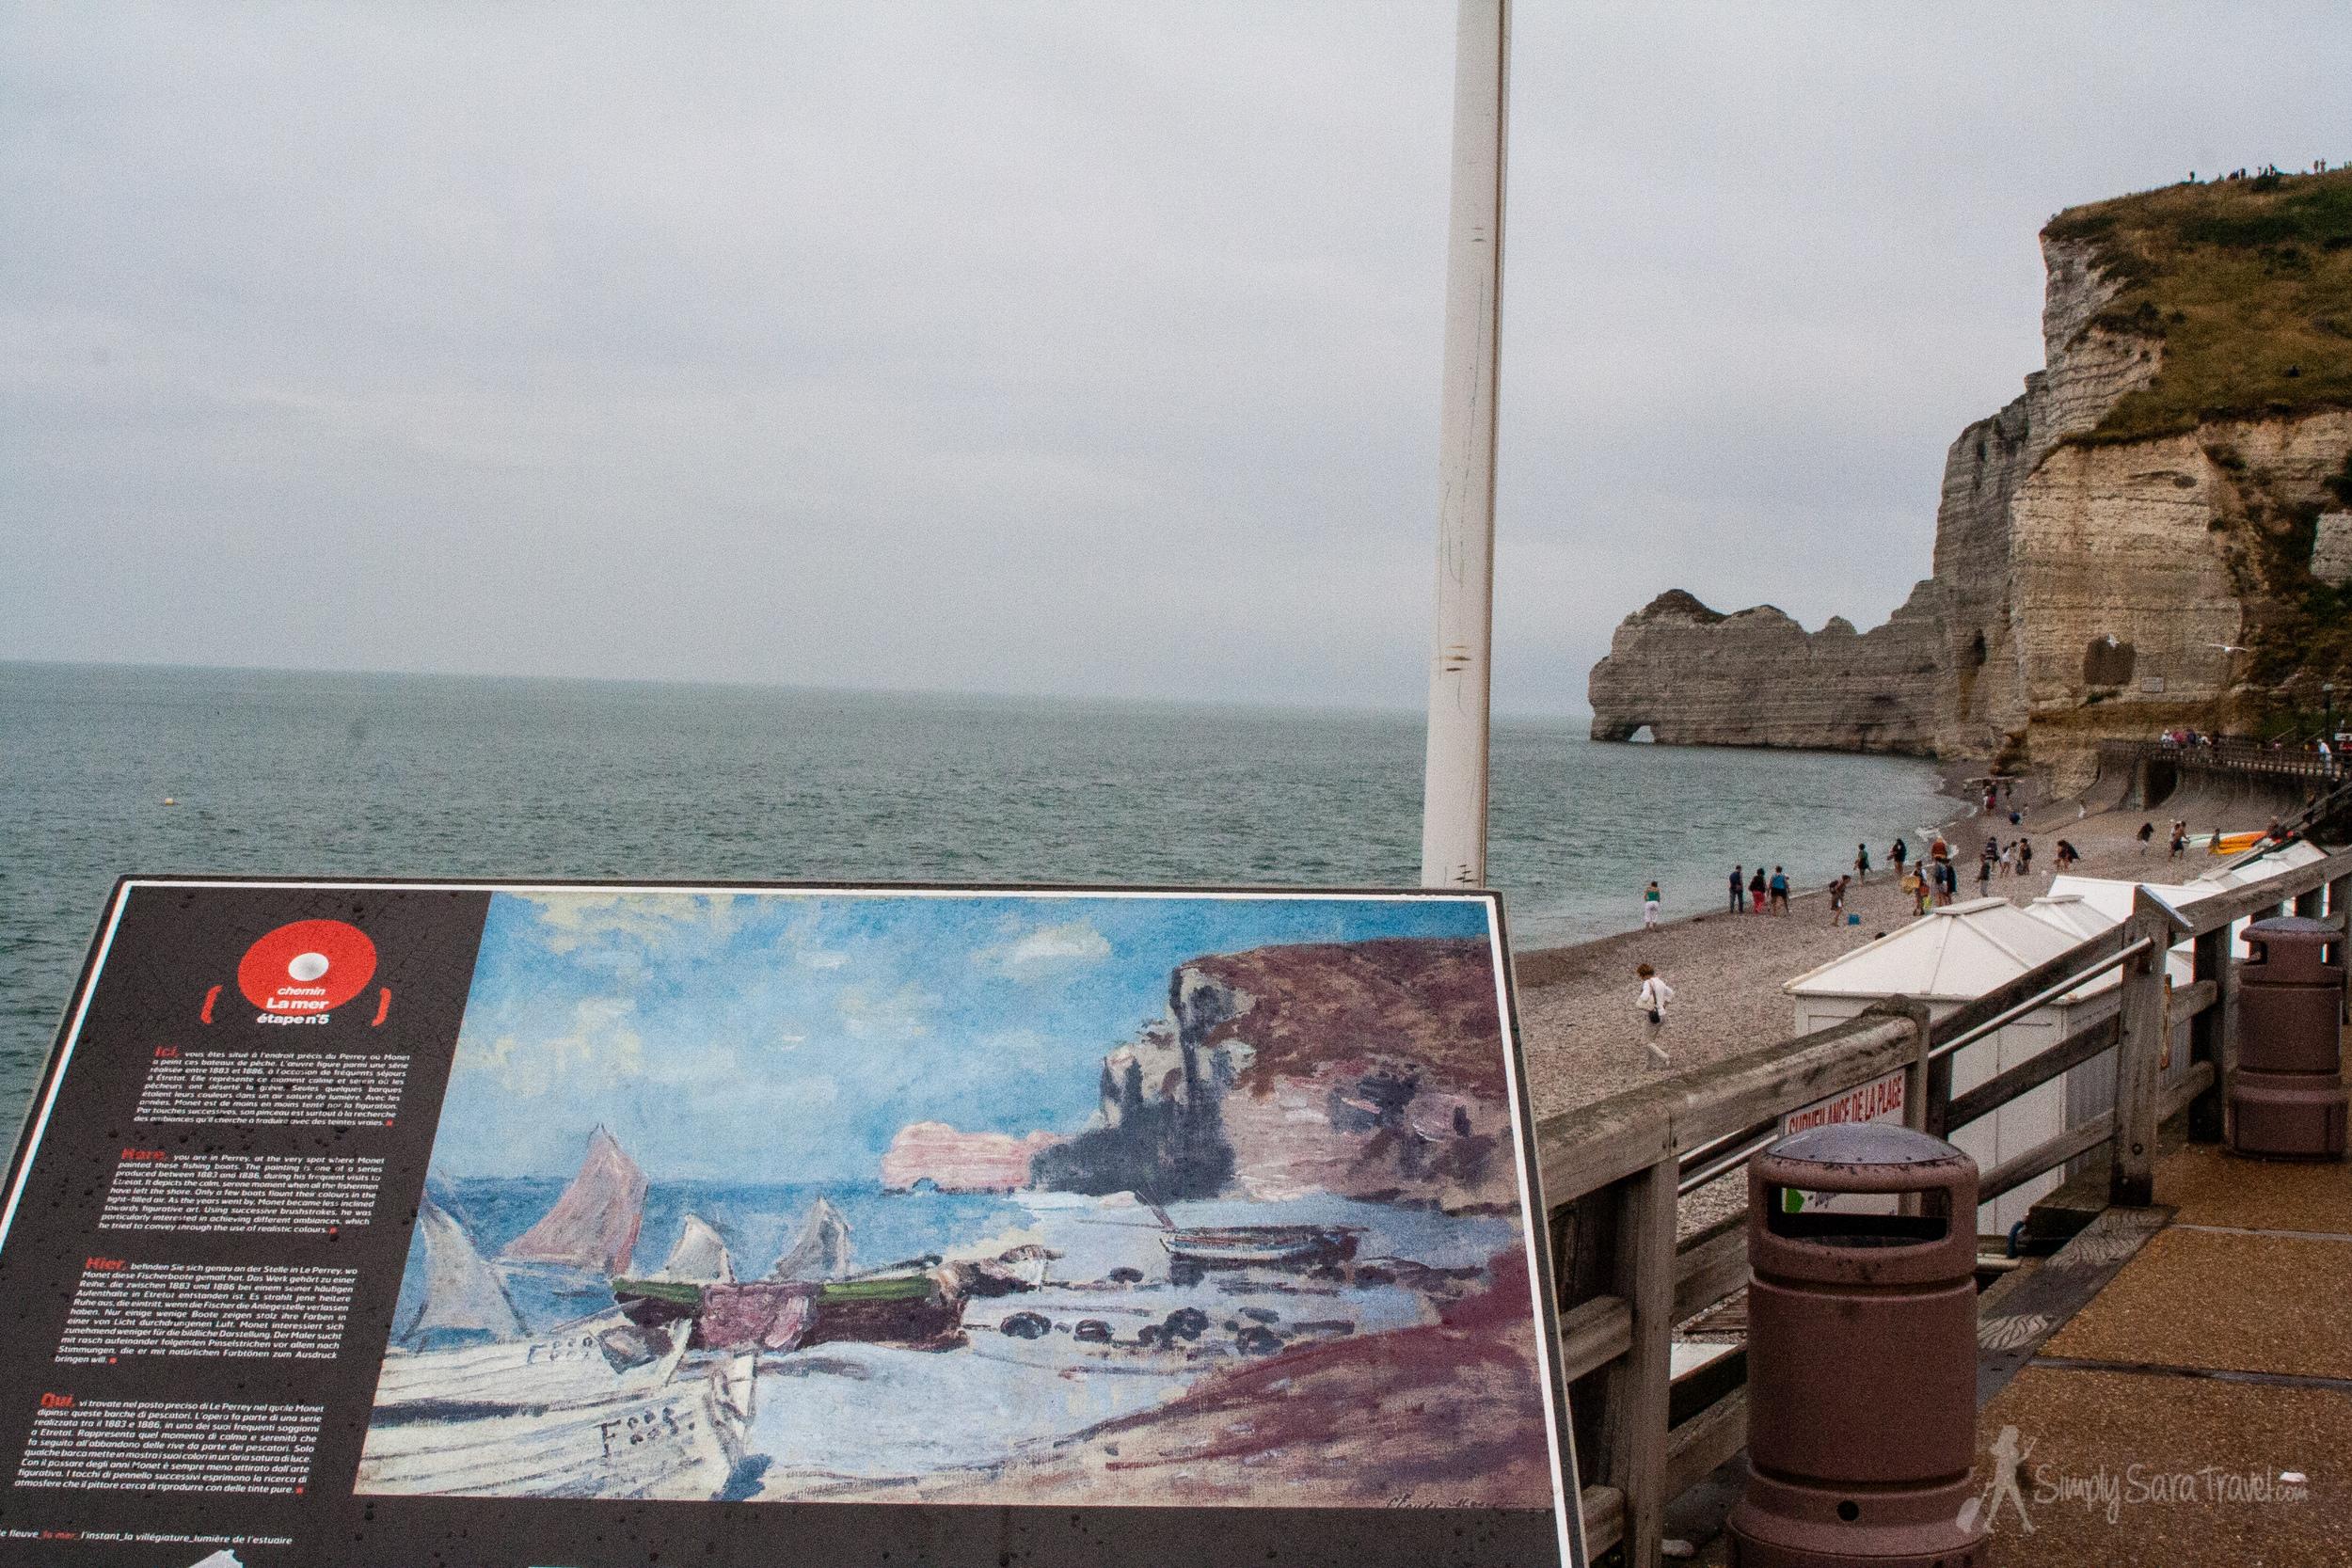 The same view Monet painted inÉtretat.